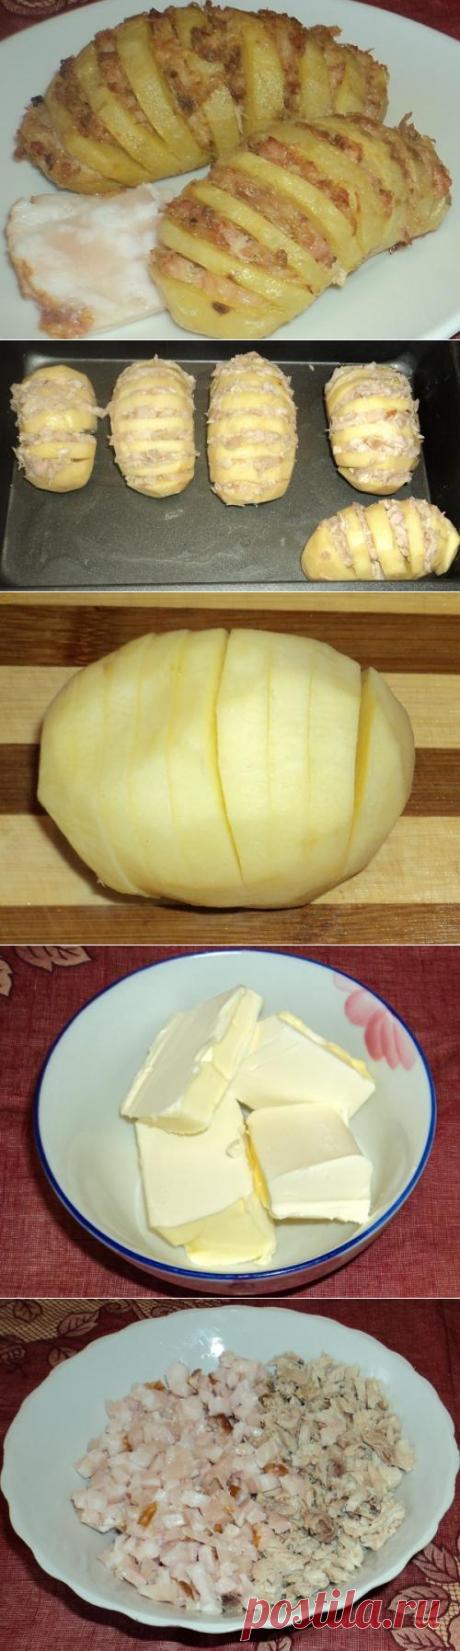 """Гармошка"" из картошки с куриным фаршем"